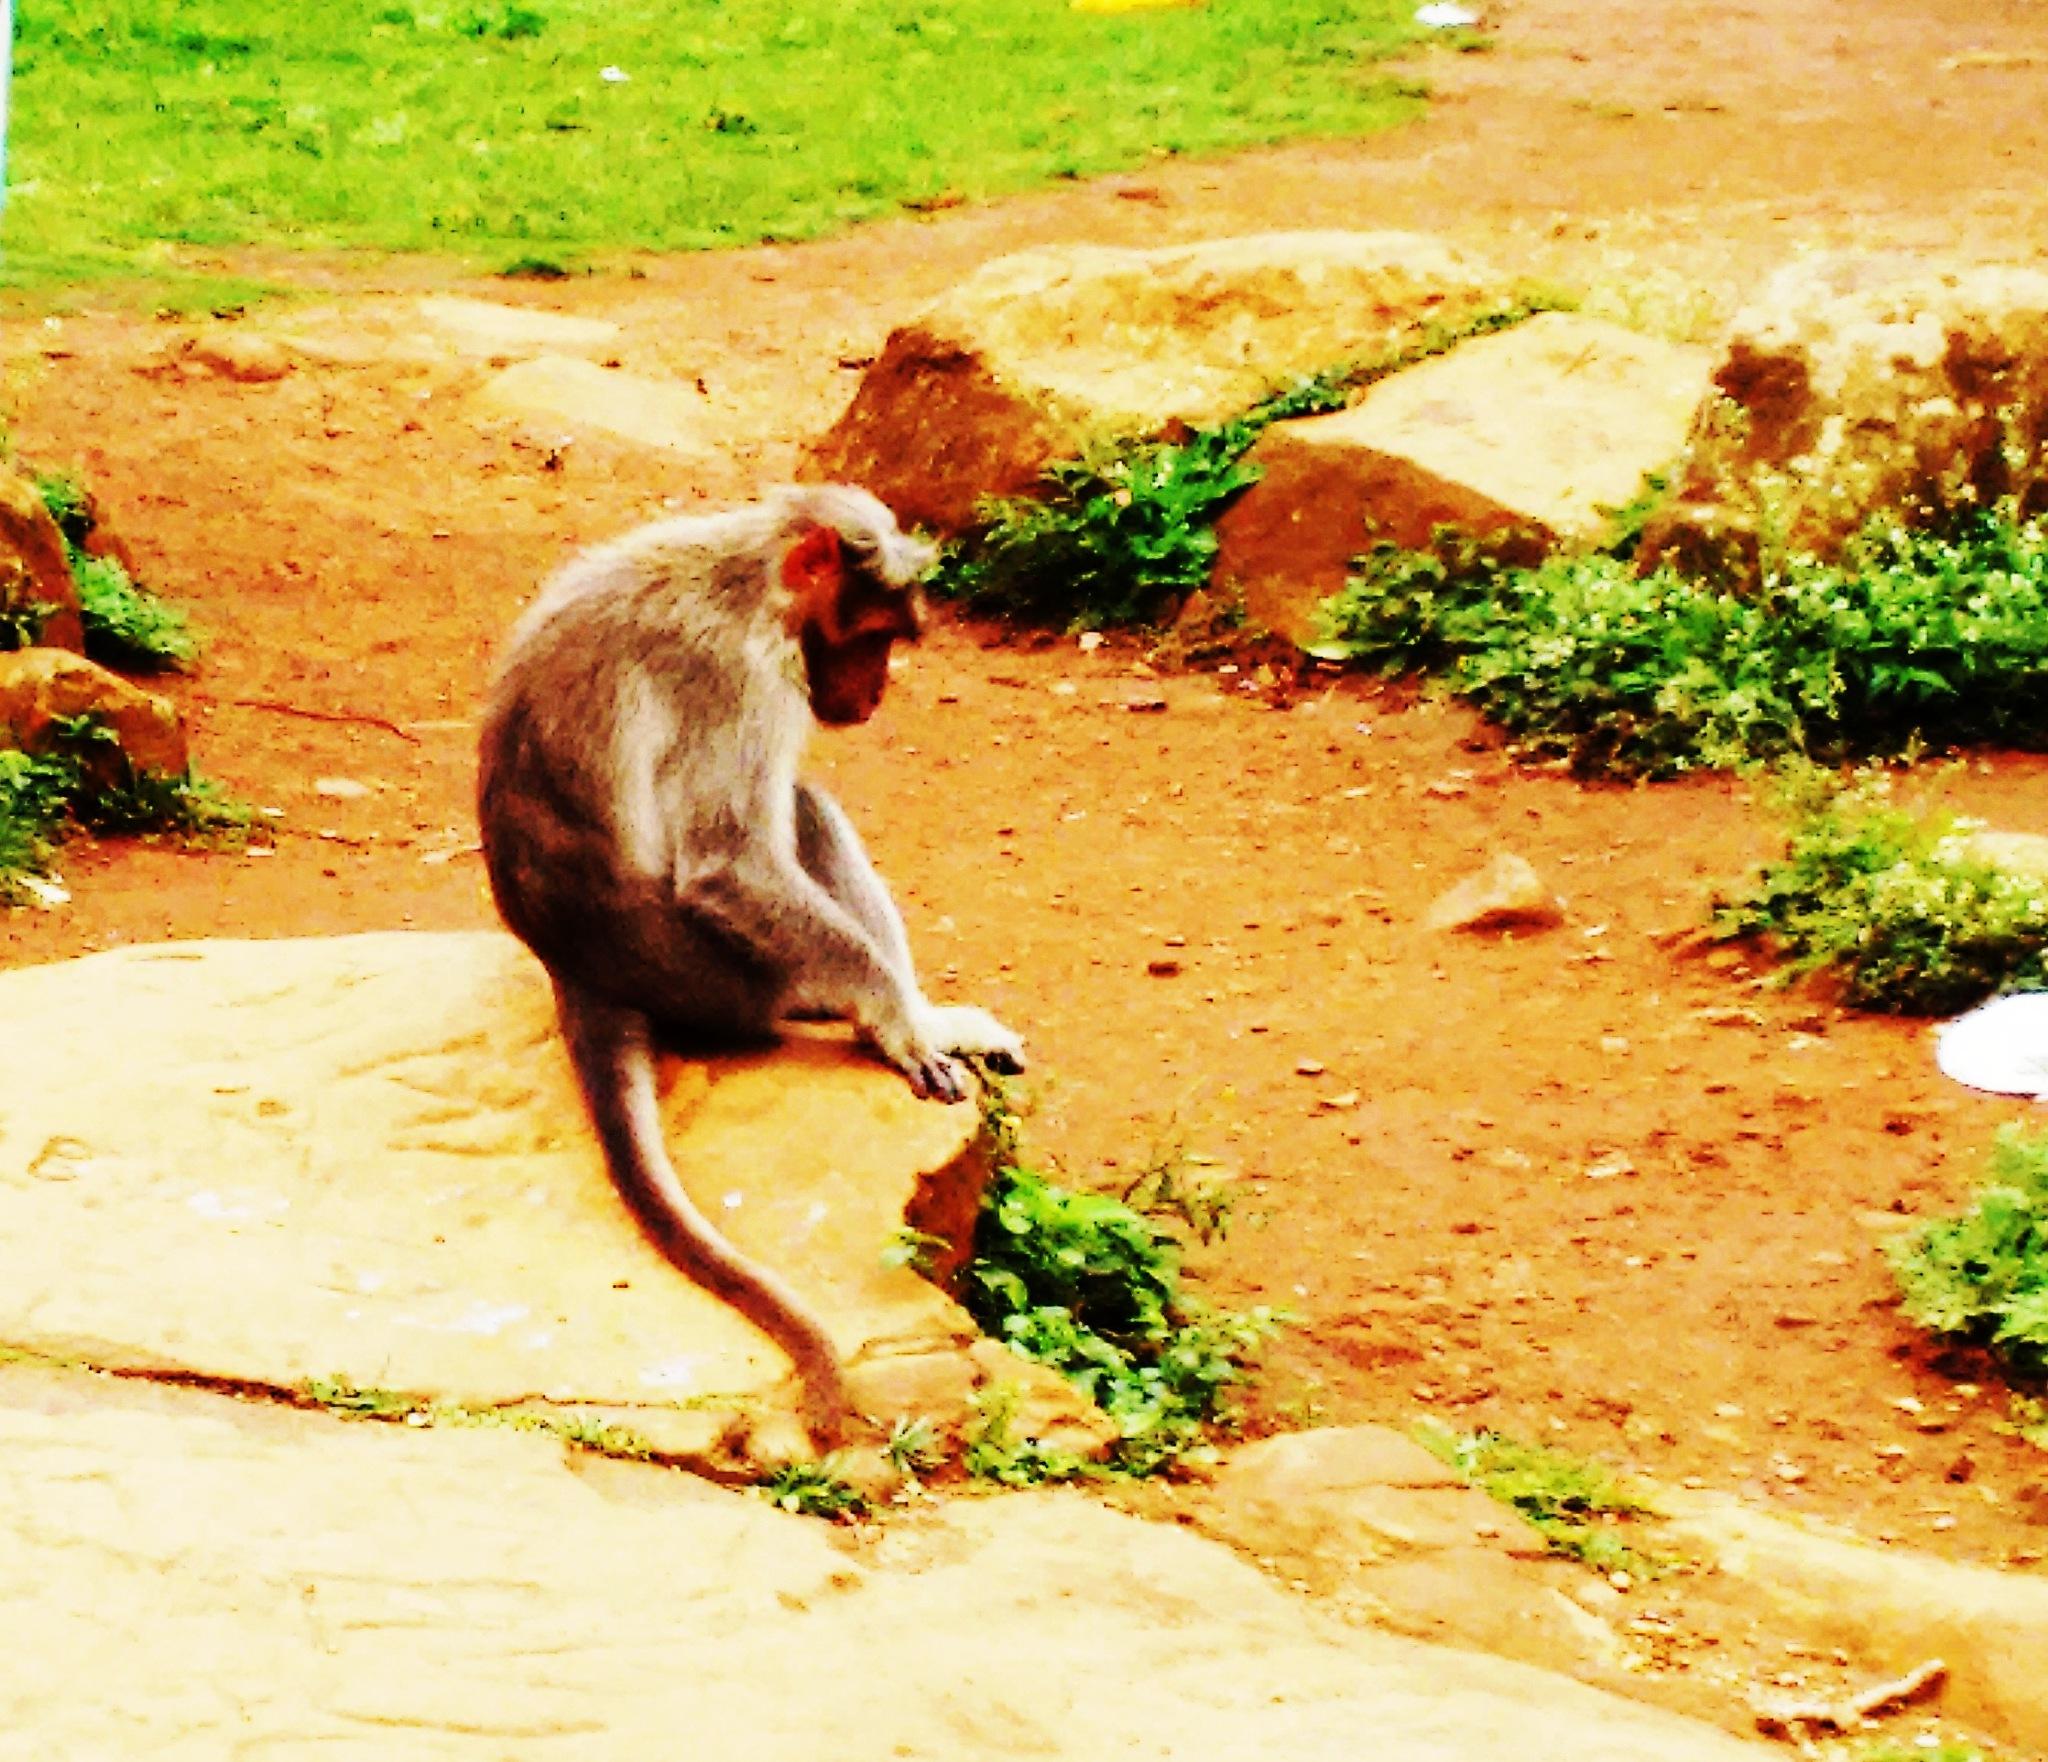 Meditating Monkey by Shankar Haritsa